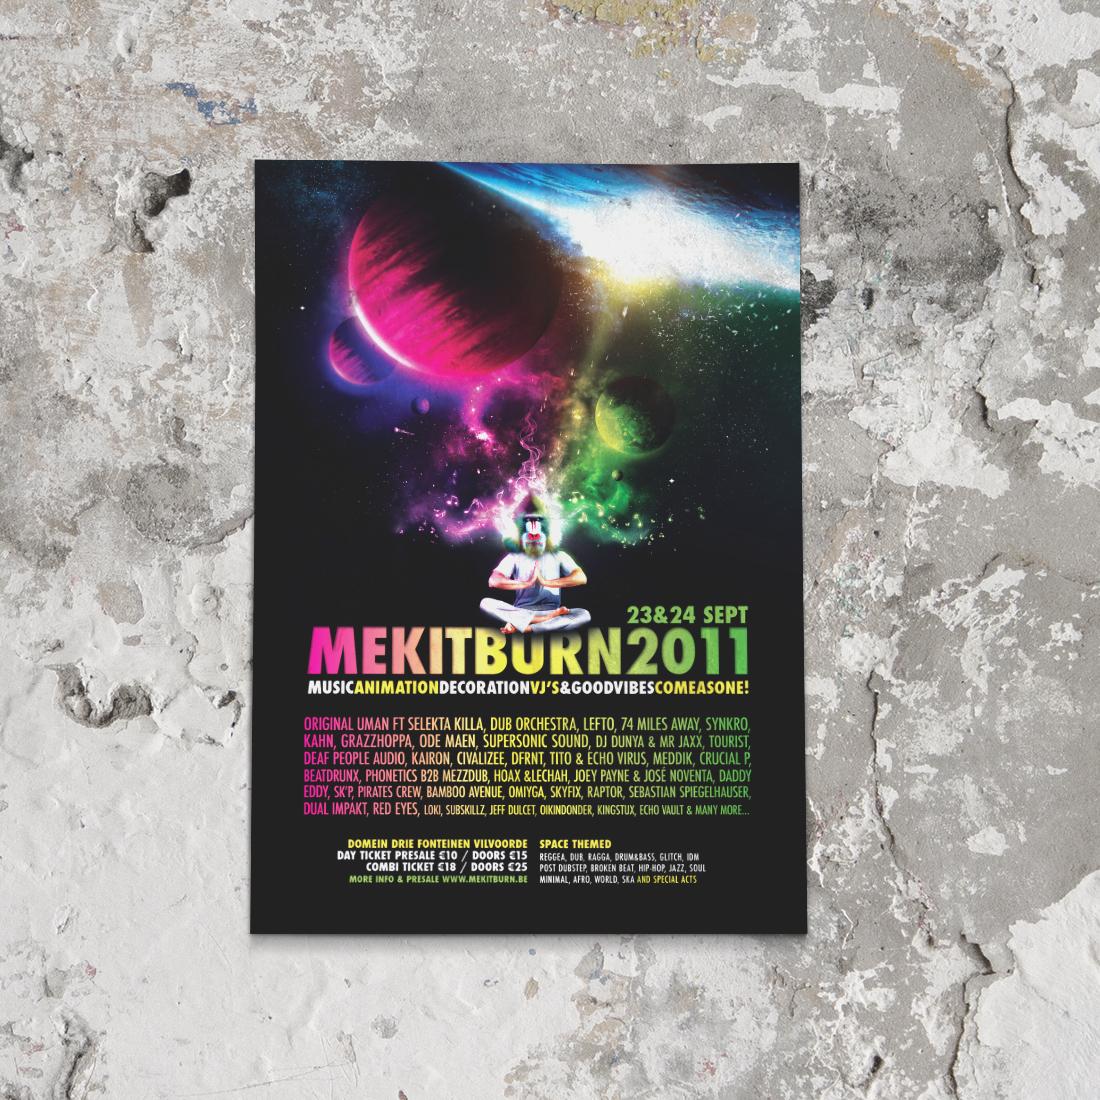 mekitburn2011_2